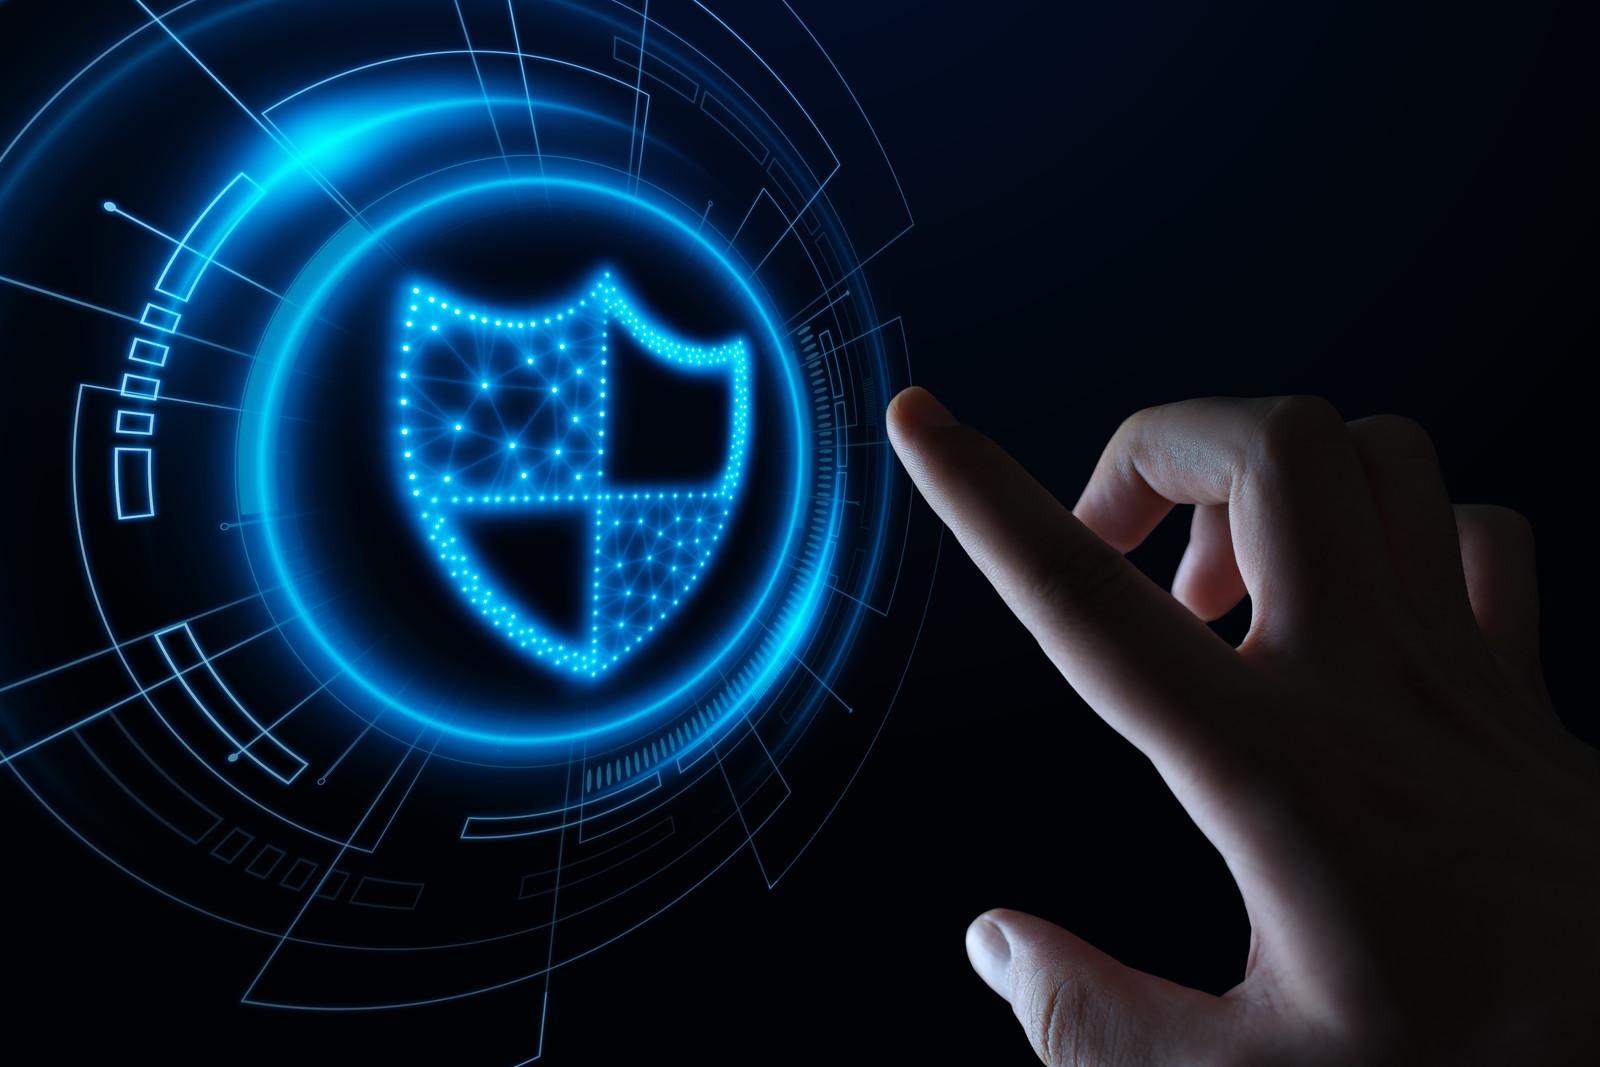 Blue hologram of a cyber shield symbolizing internet security